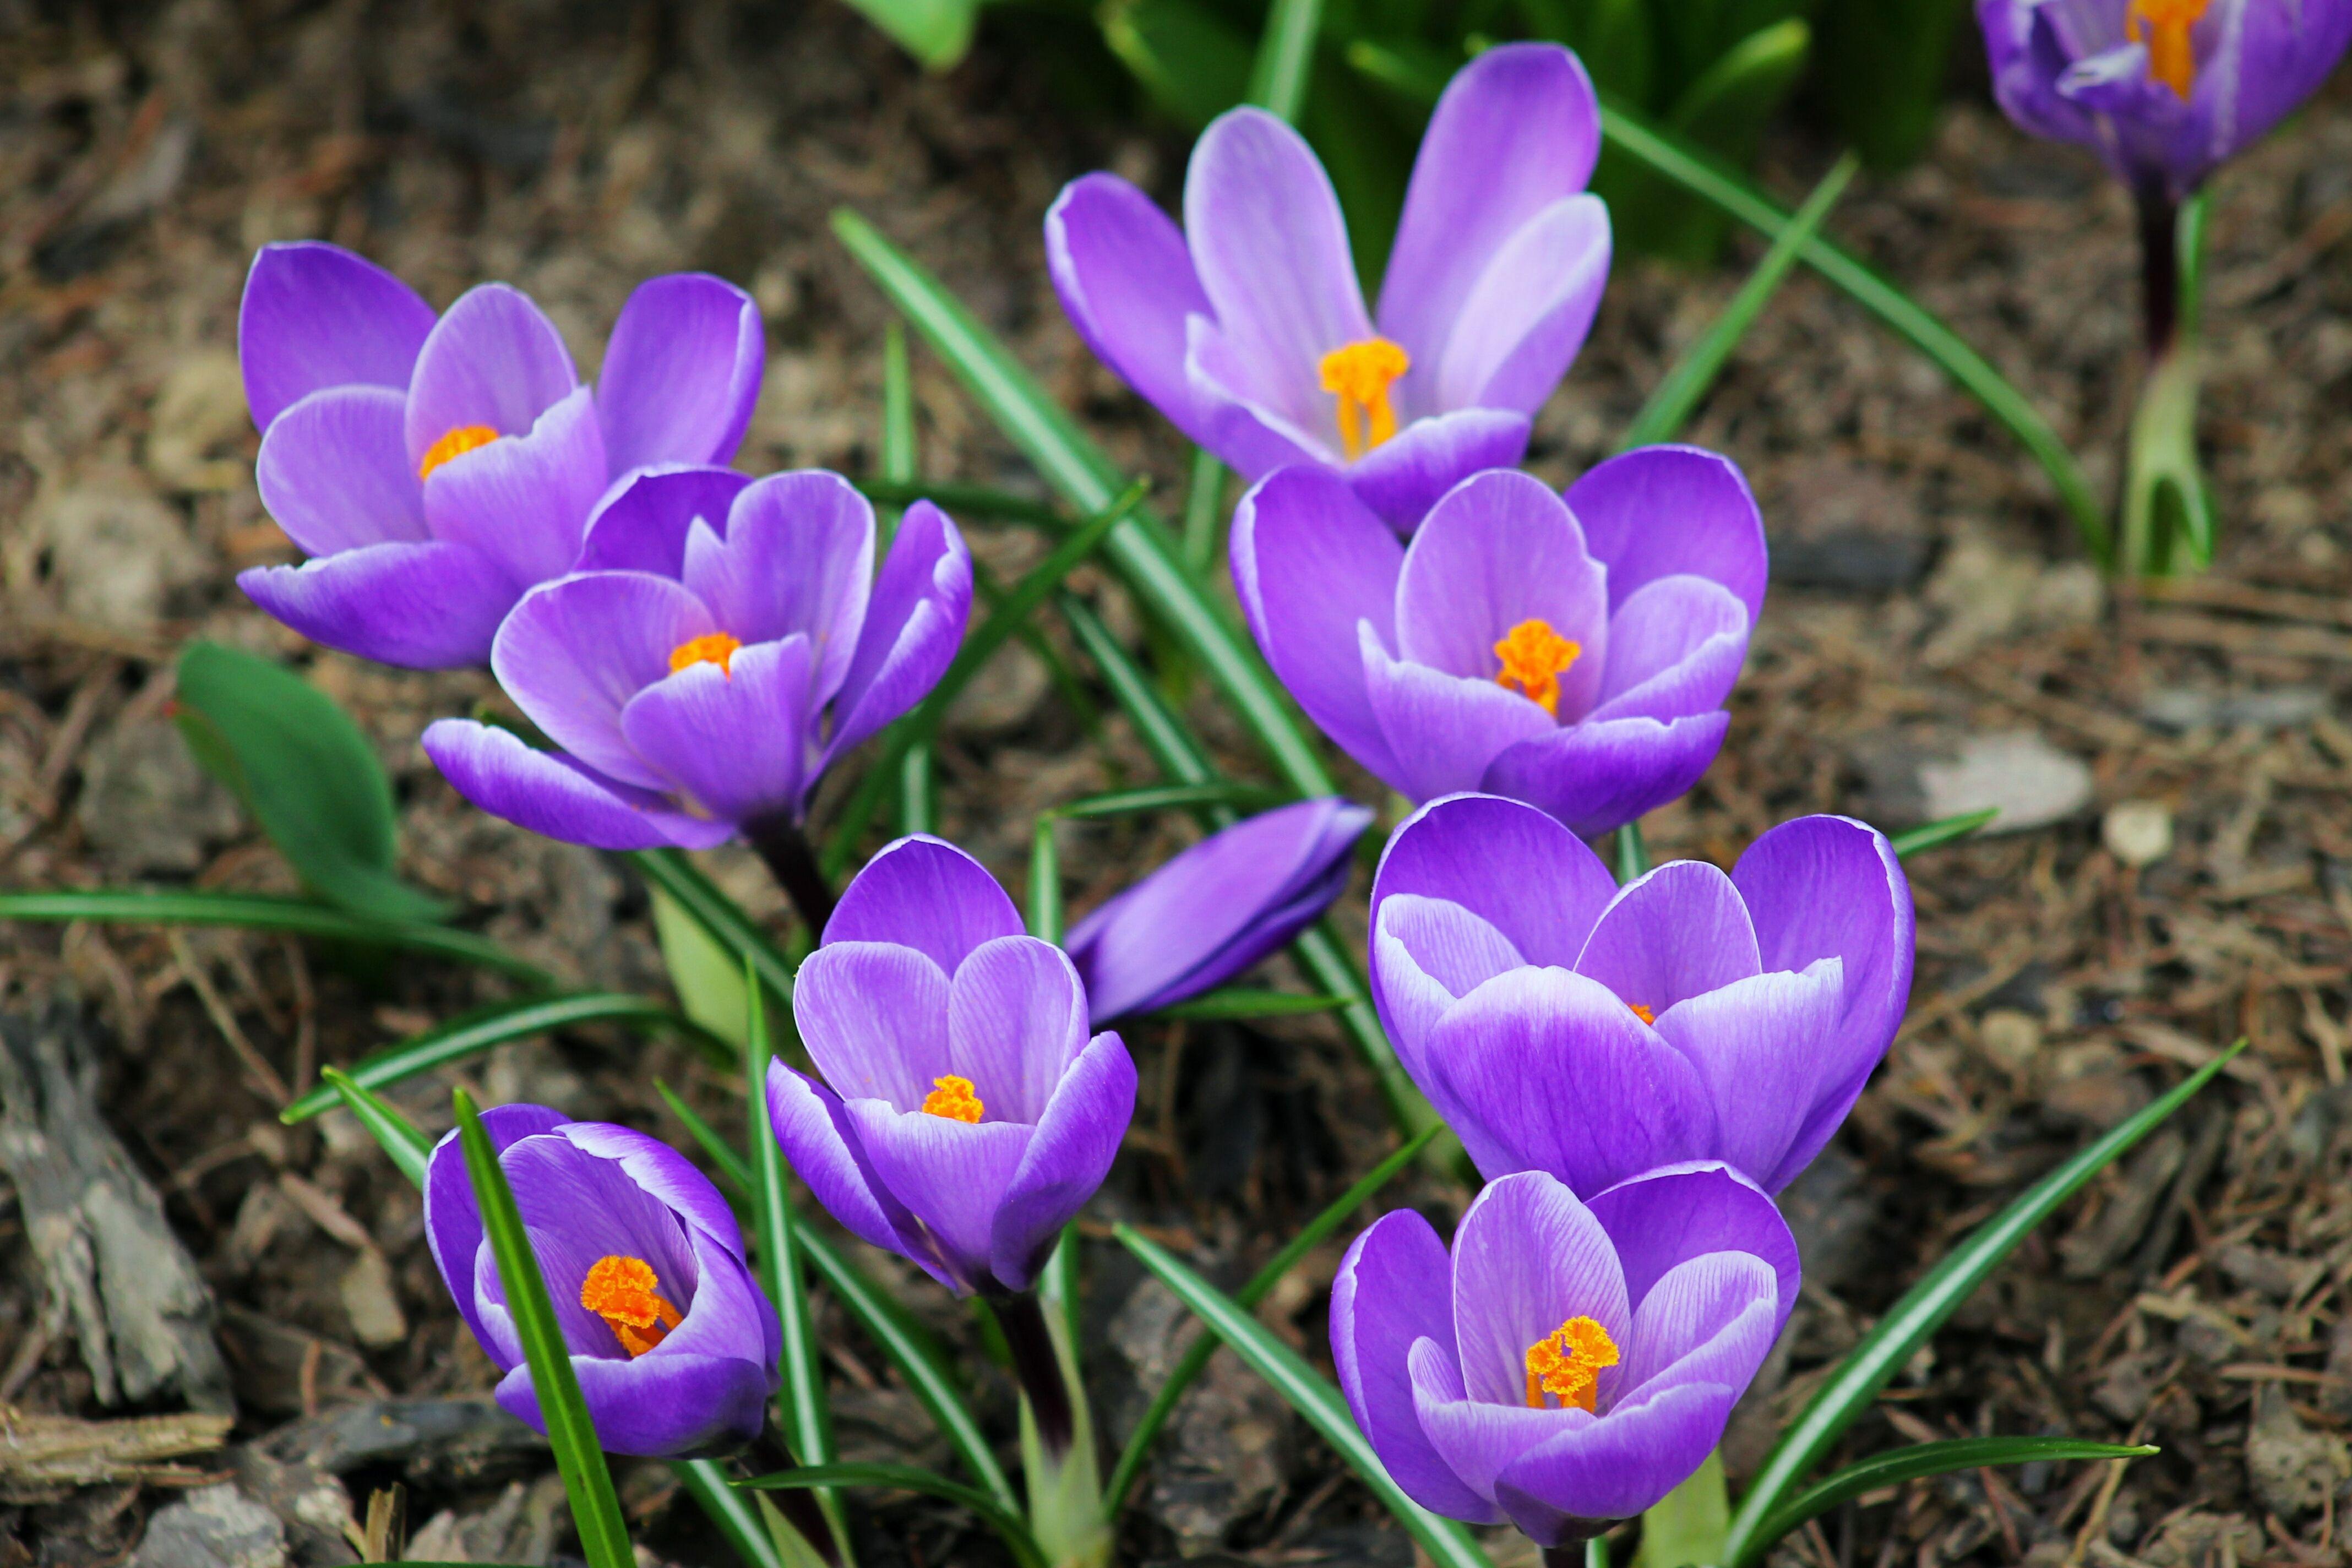 'Grand Maitre' crocus with purple flowers